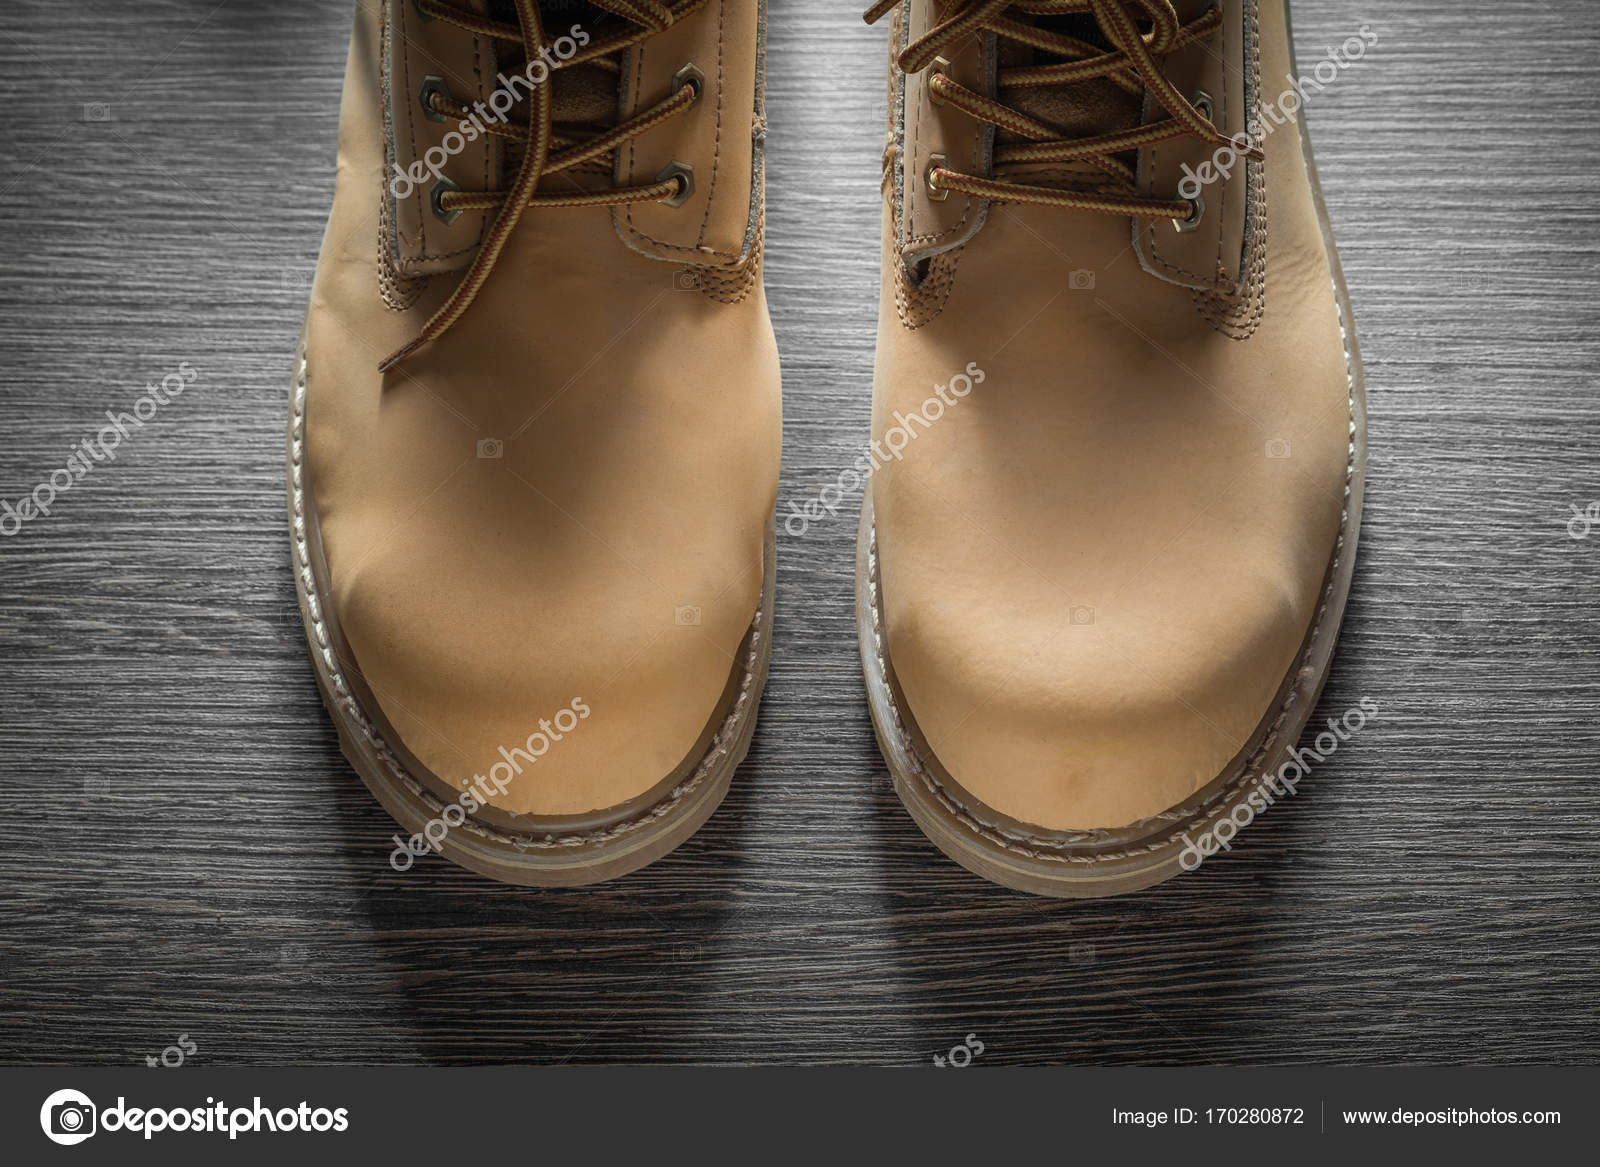 2b251dd8904 Ζευγάρι των αδιάβροχες μπότες εργασίας στην ξύλινη σανίδα– εικόνα αρχείου